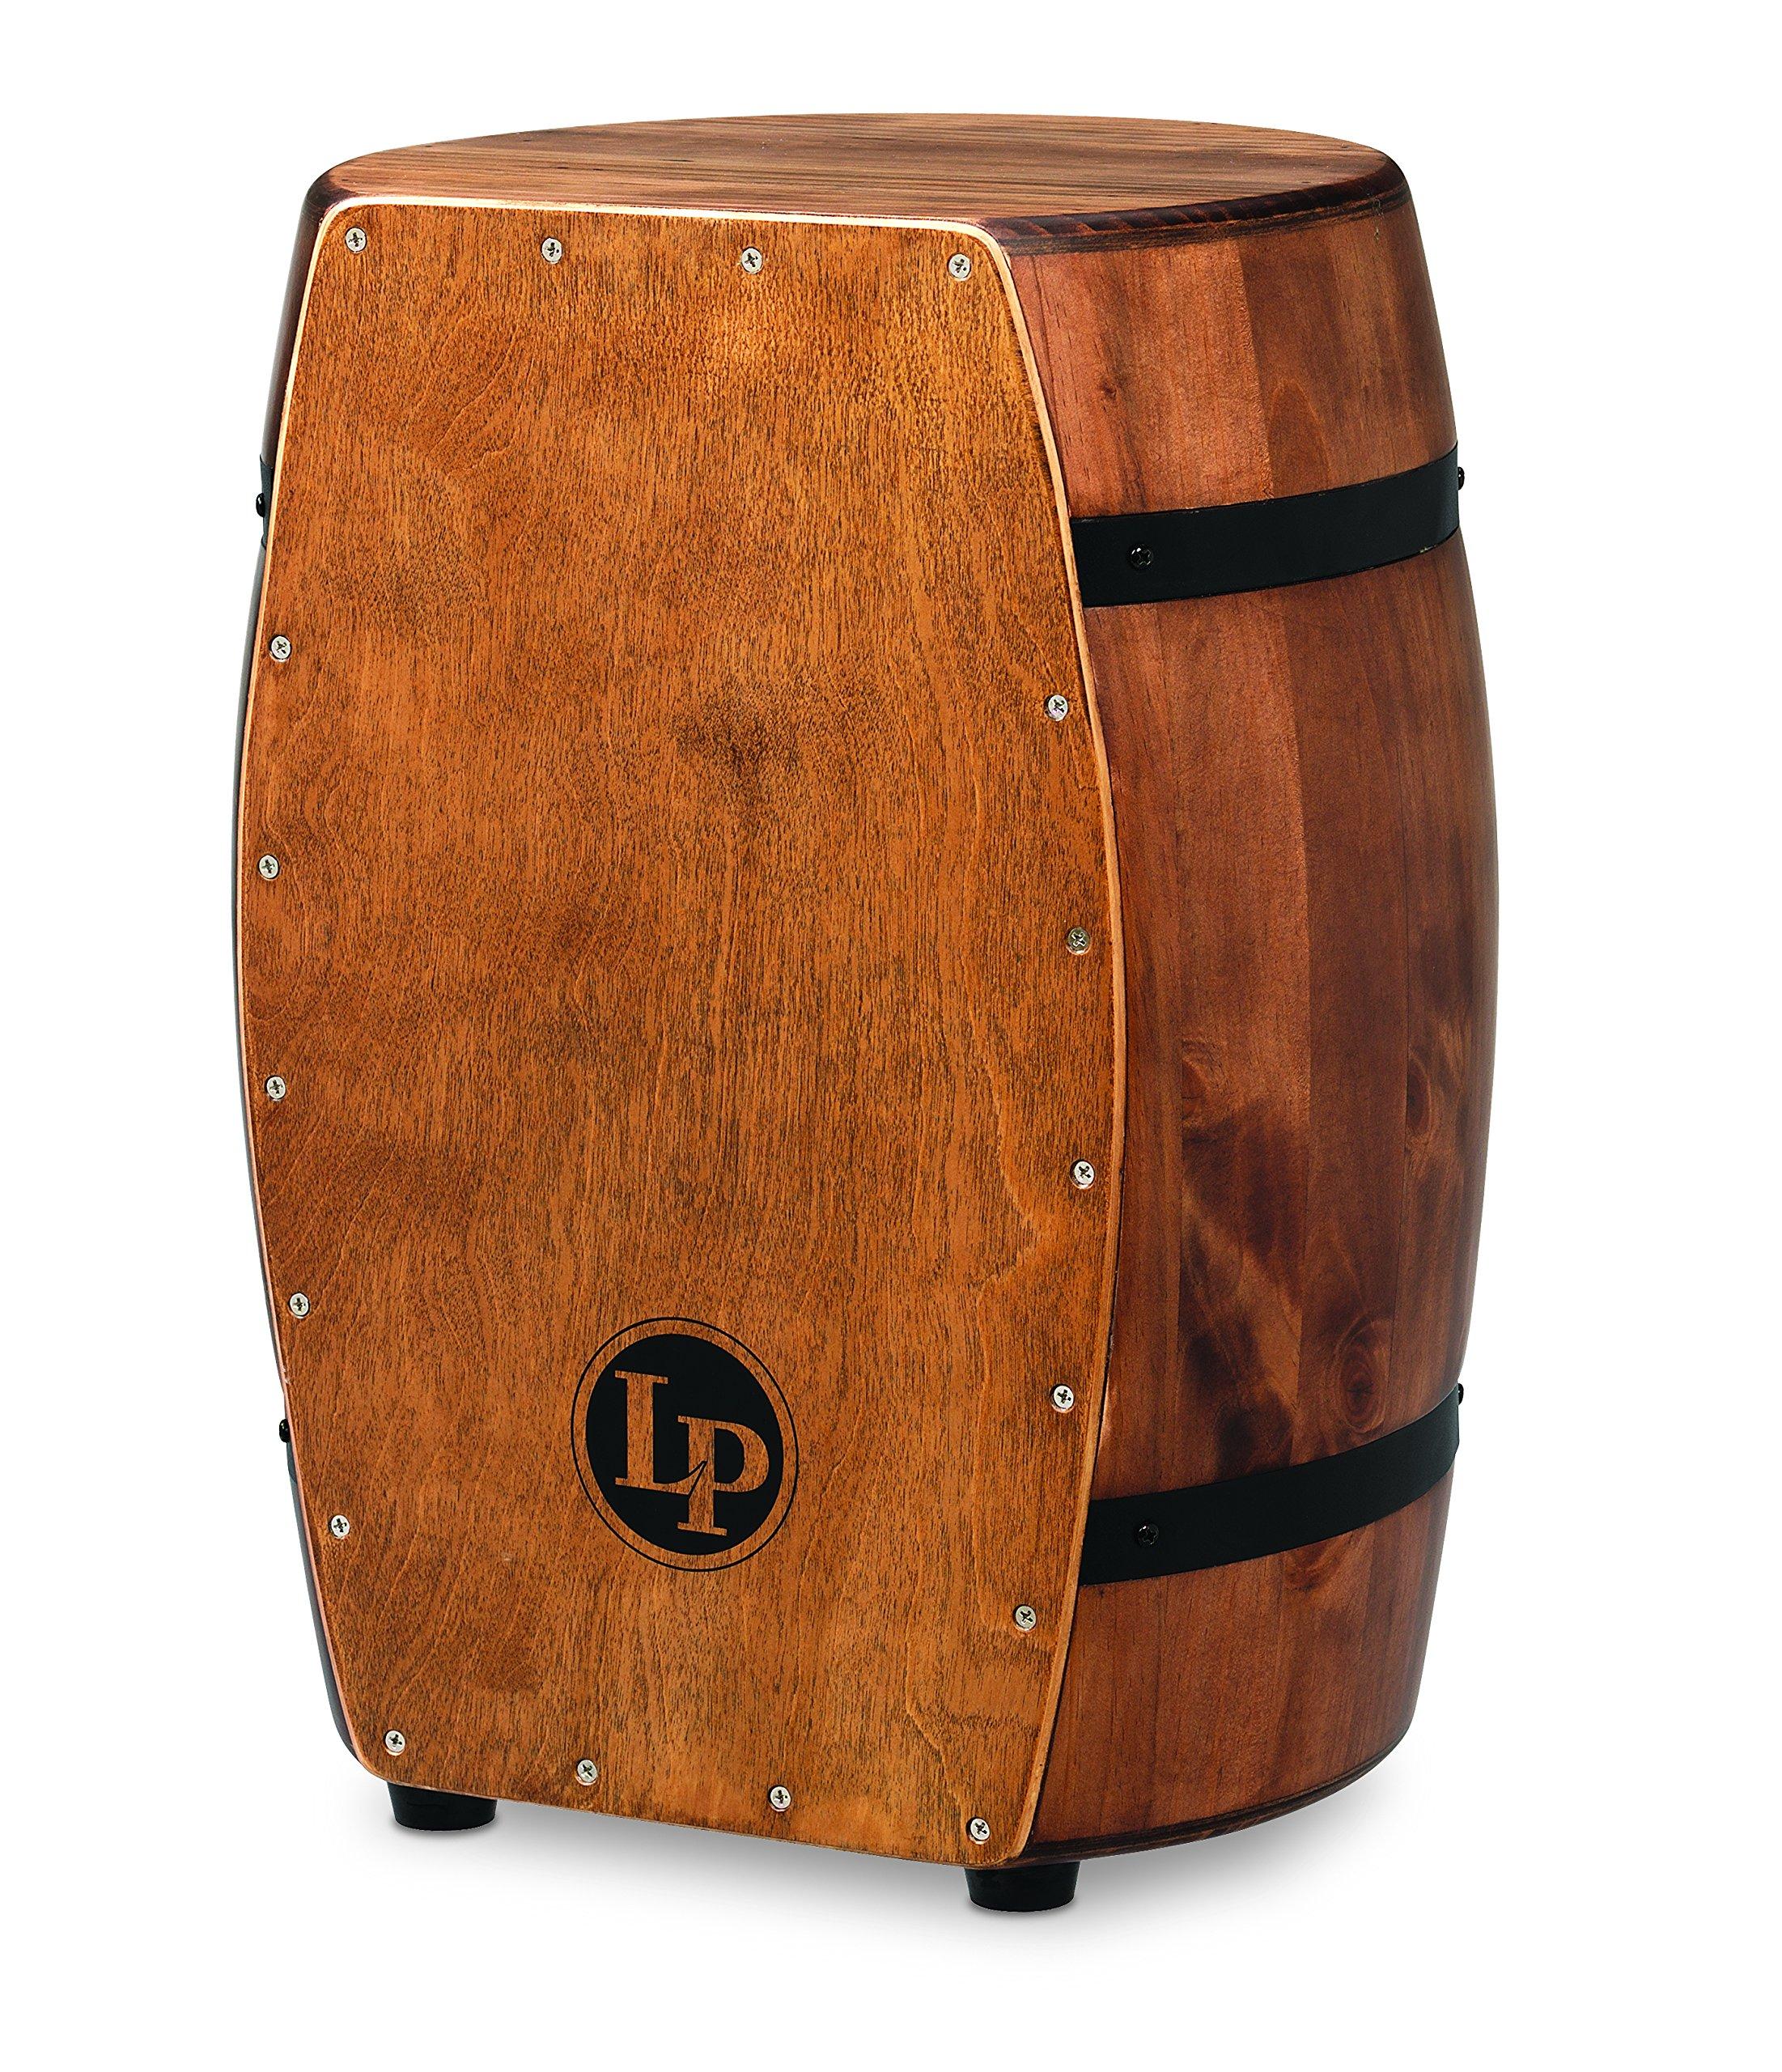 Latin Percussion Matador Whiskey Barrel Cajon -Tumba by Latin Percussion (Image #1)